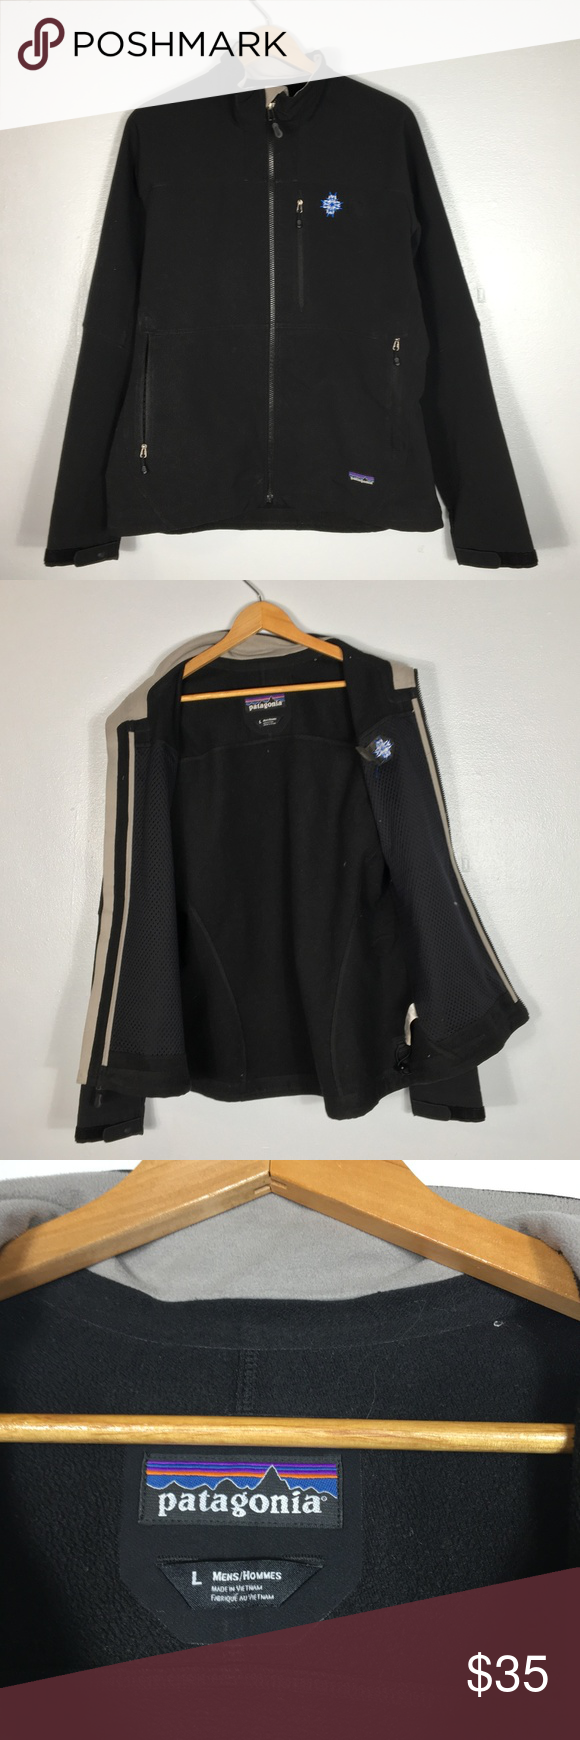 PATAGONIA Company Issue Logo Black Jacket Size L